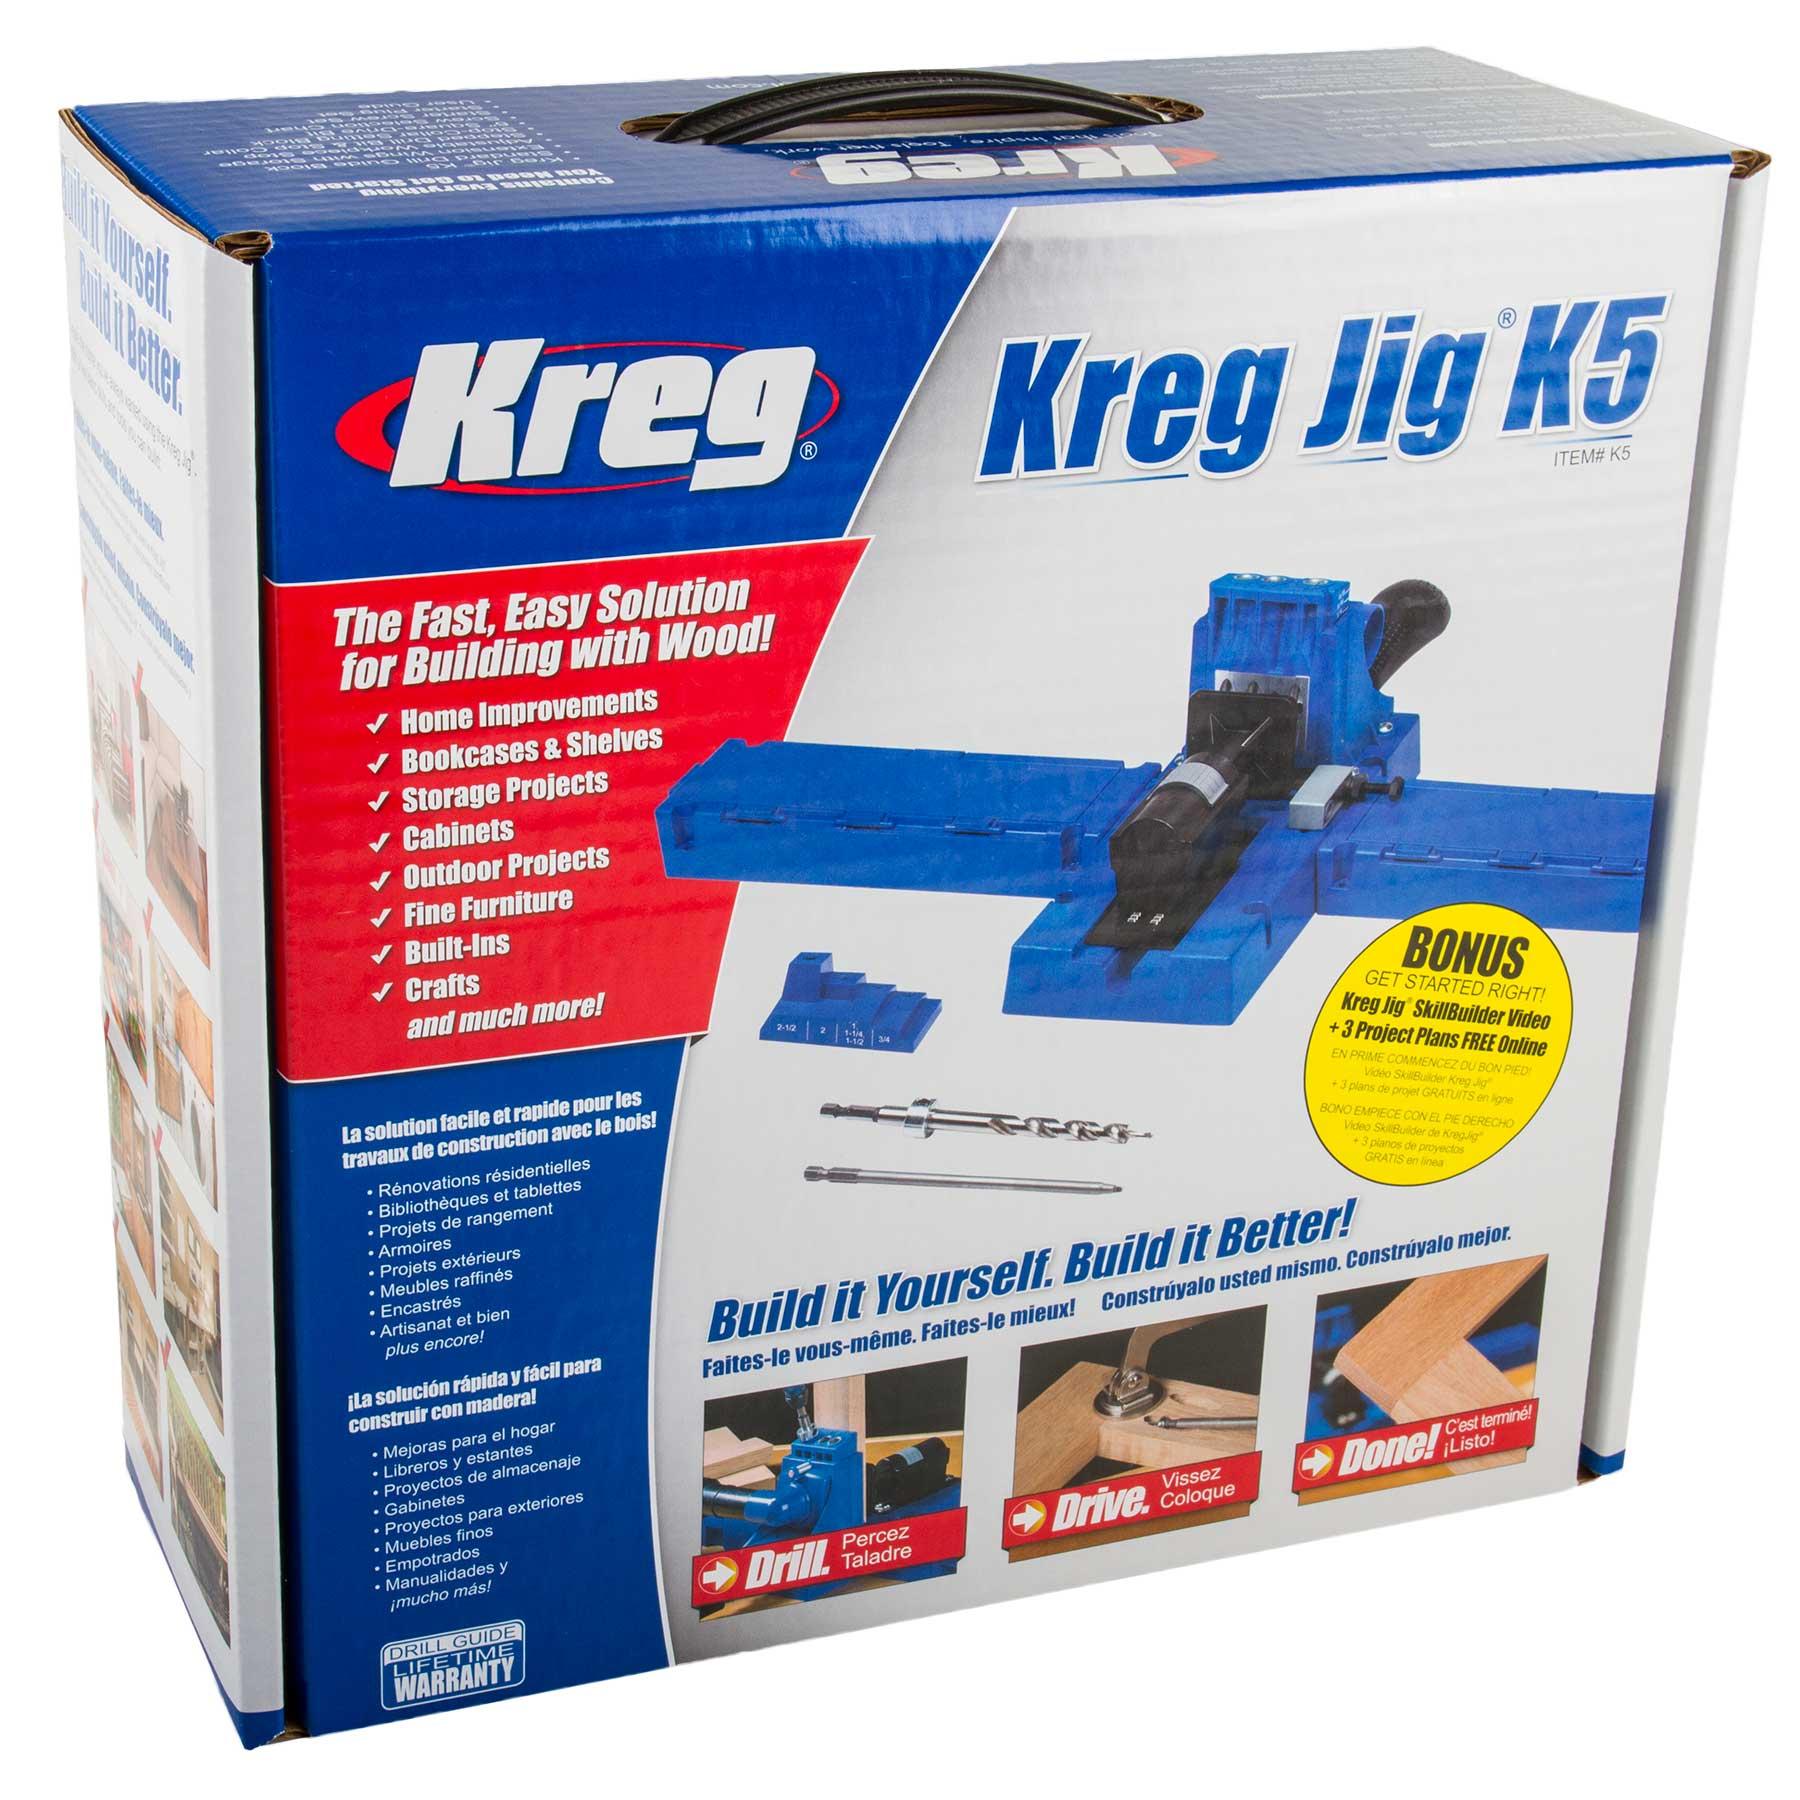 Kreg 228458 jig k5 kreg 228458 jig k5 bamford trading kreg 228458 jig k5 solutioingenieria Choice Image